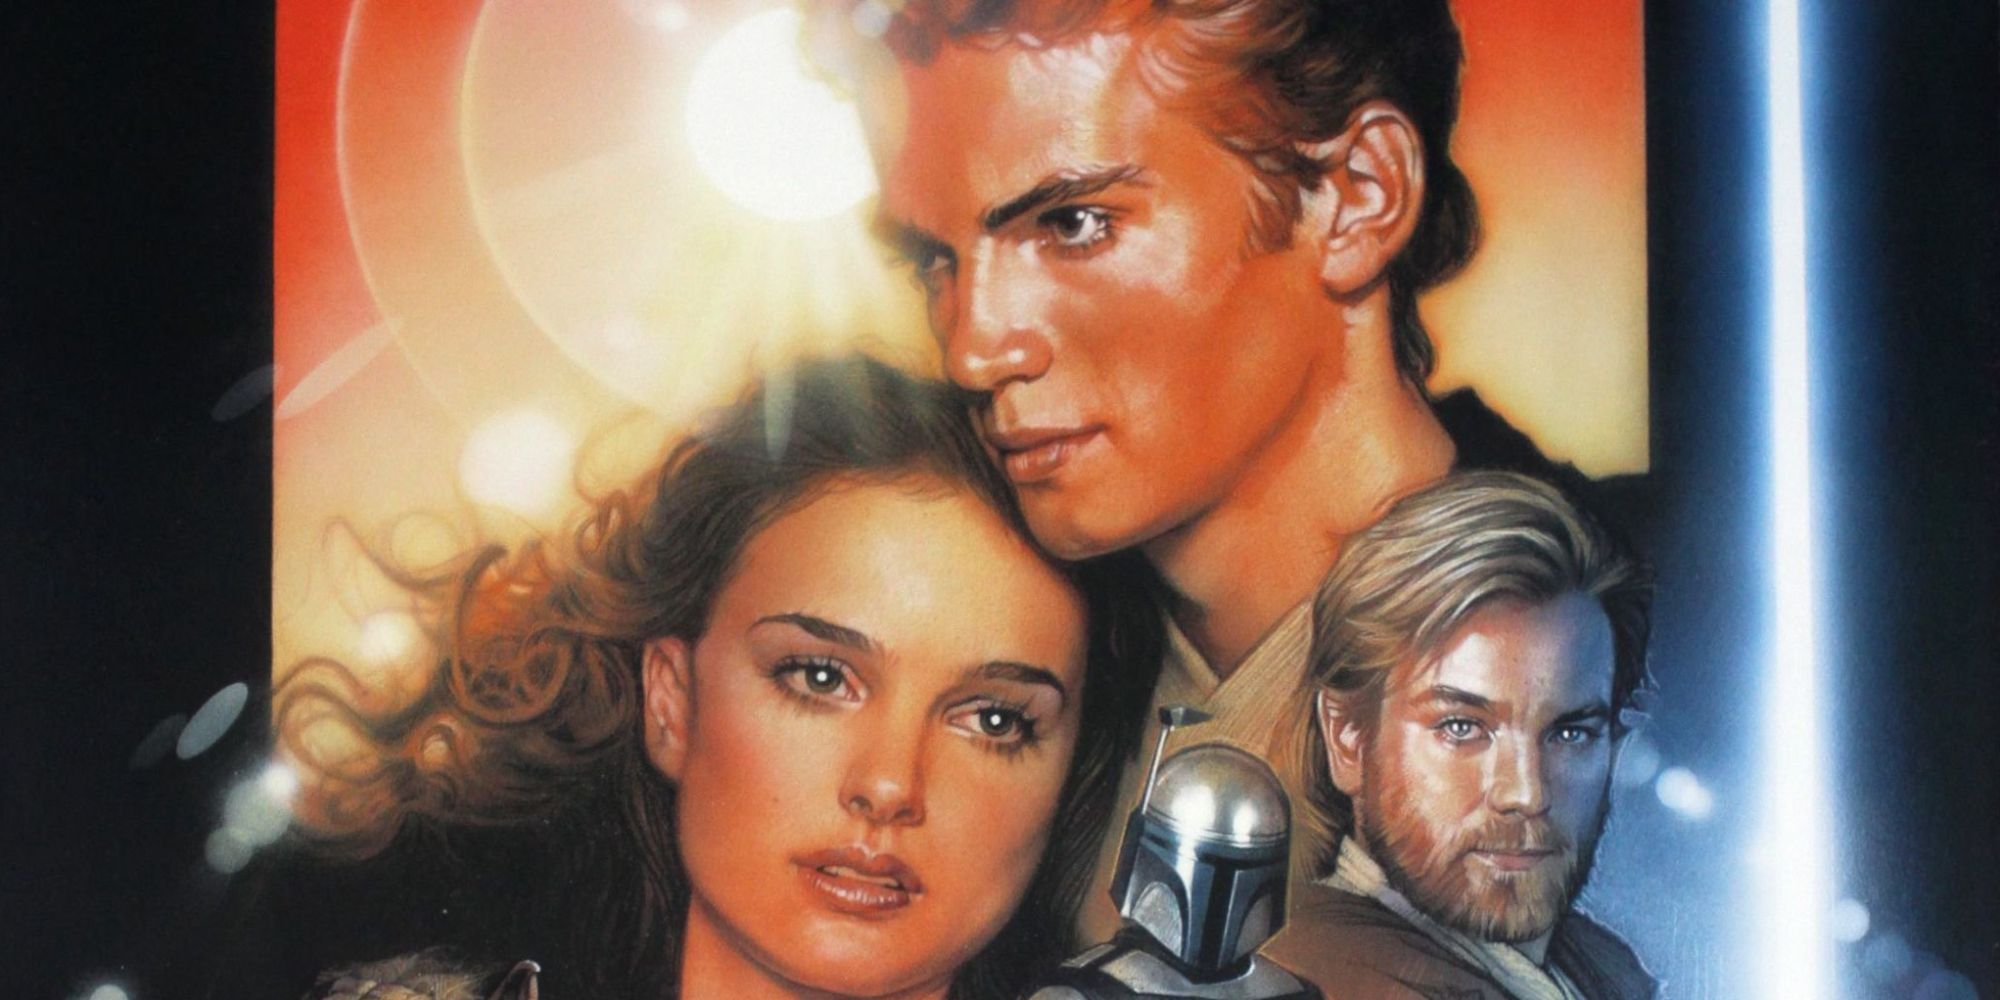 star wars episode 2 swesub